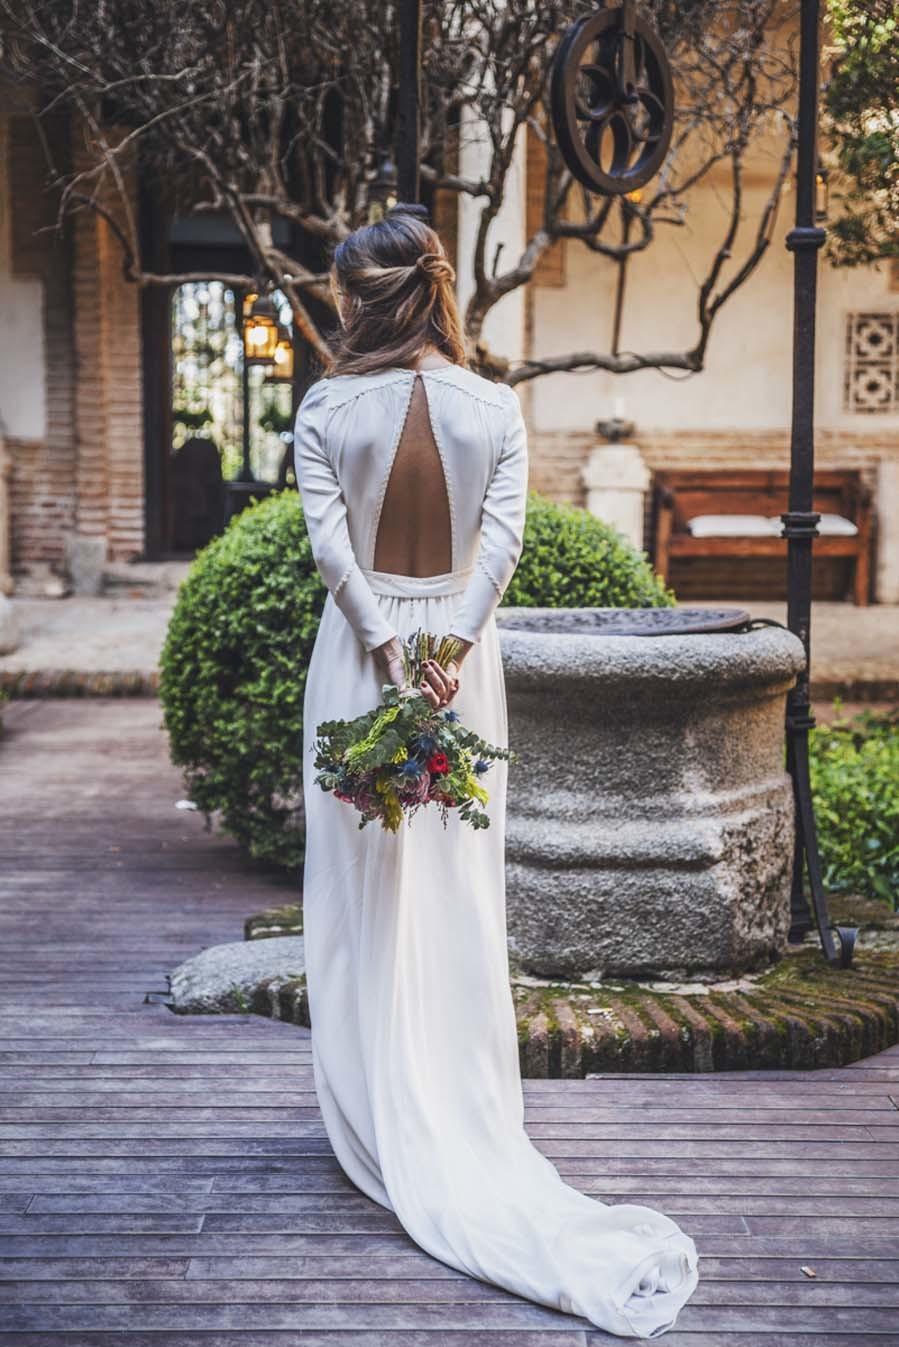 Dona tu vestido de novia